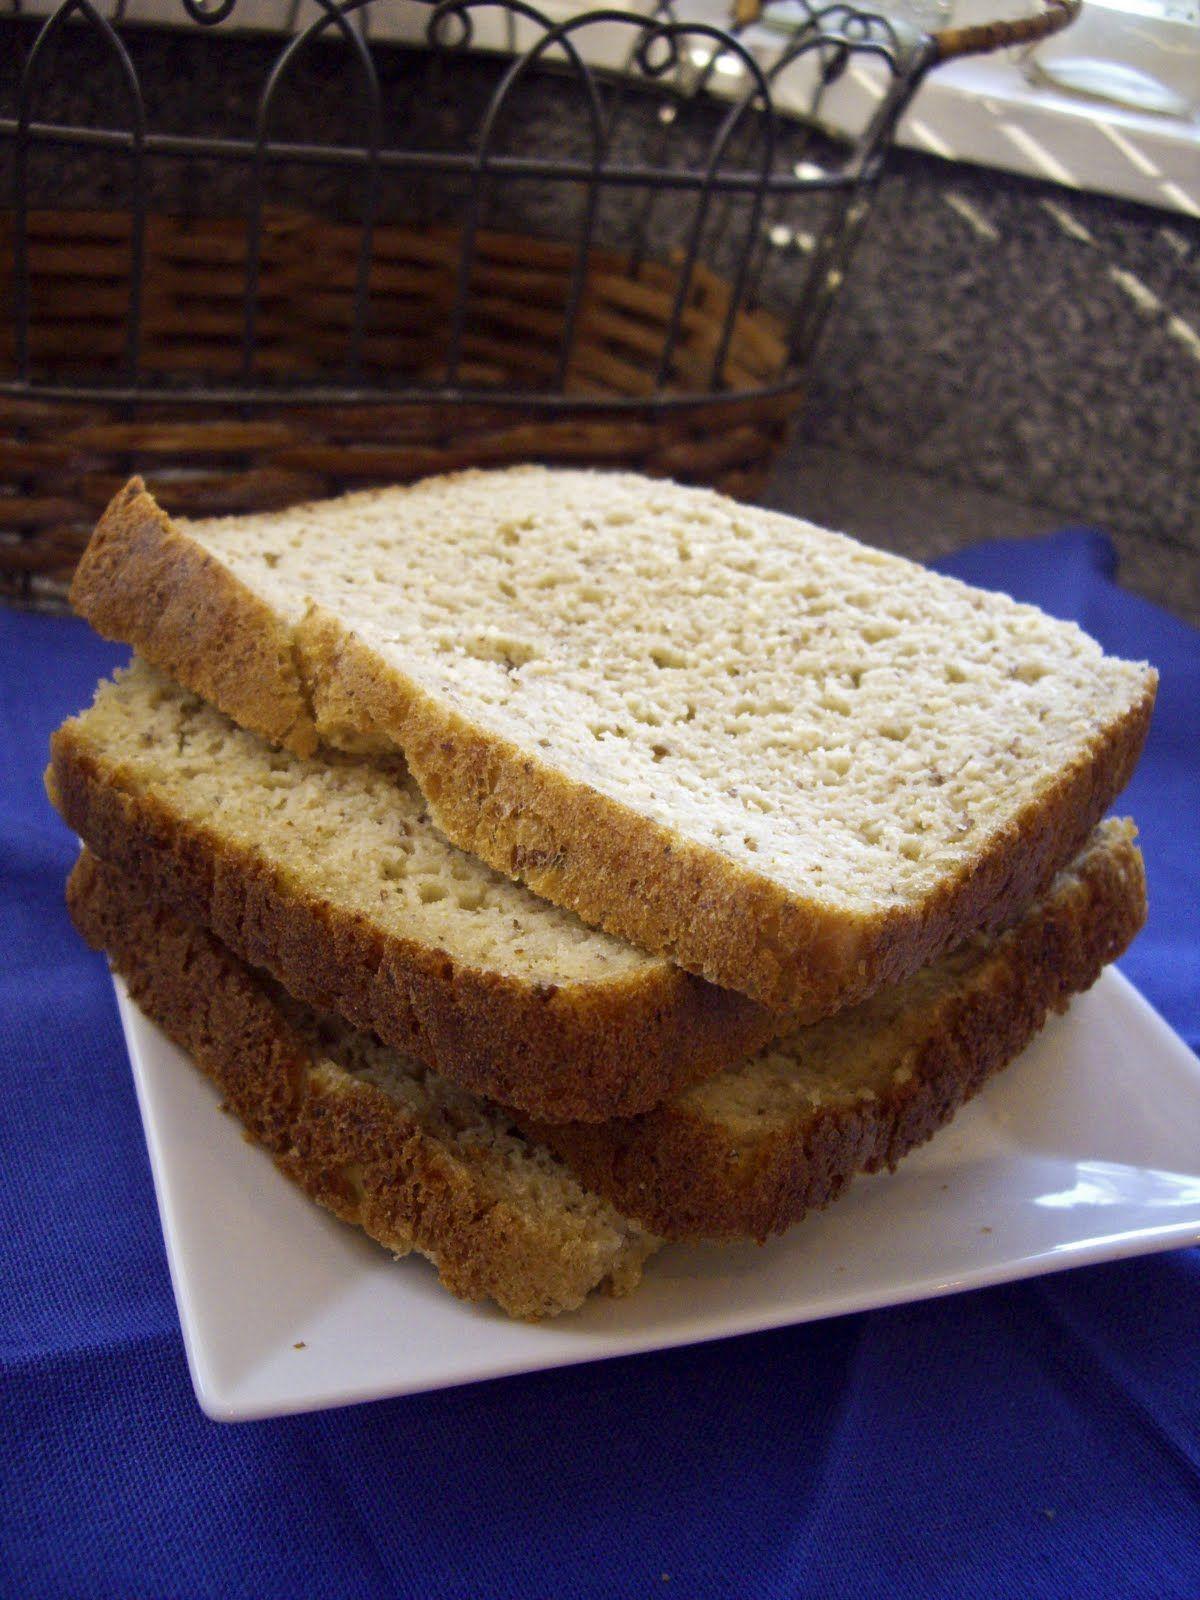 Munchin' Mochi Vegan Gluten Free (And Healthy) Bread for